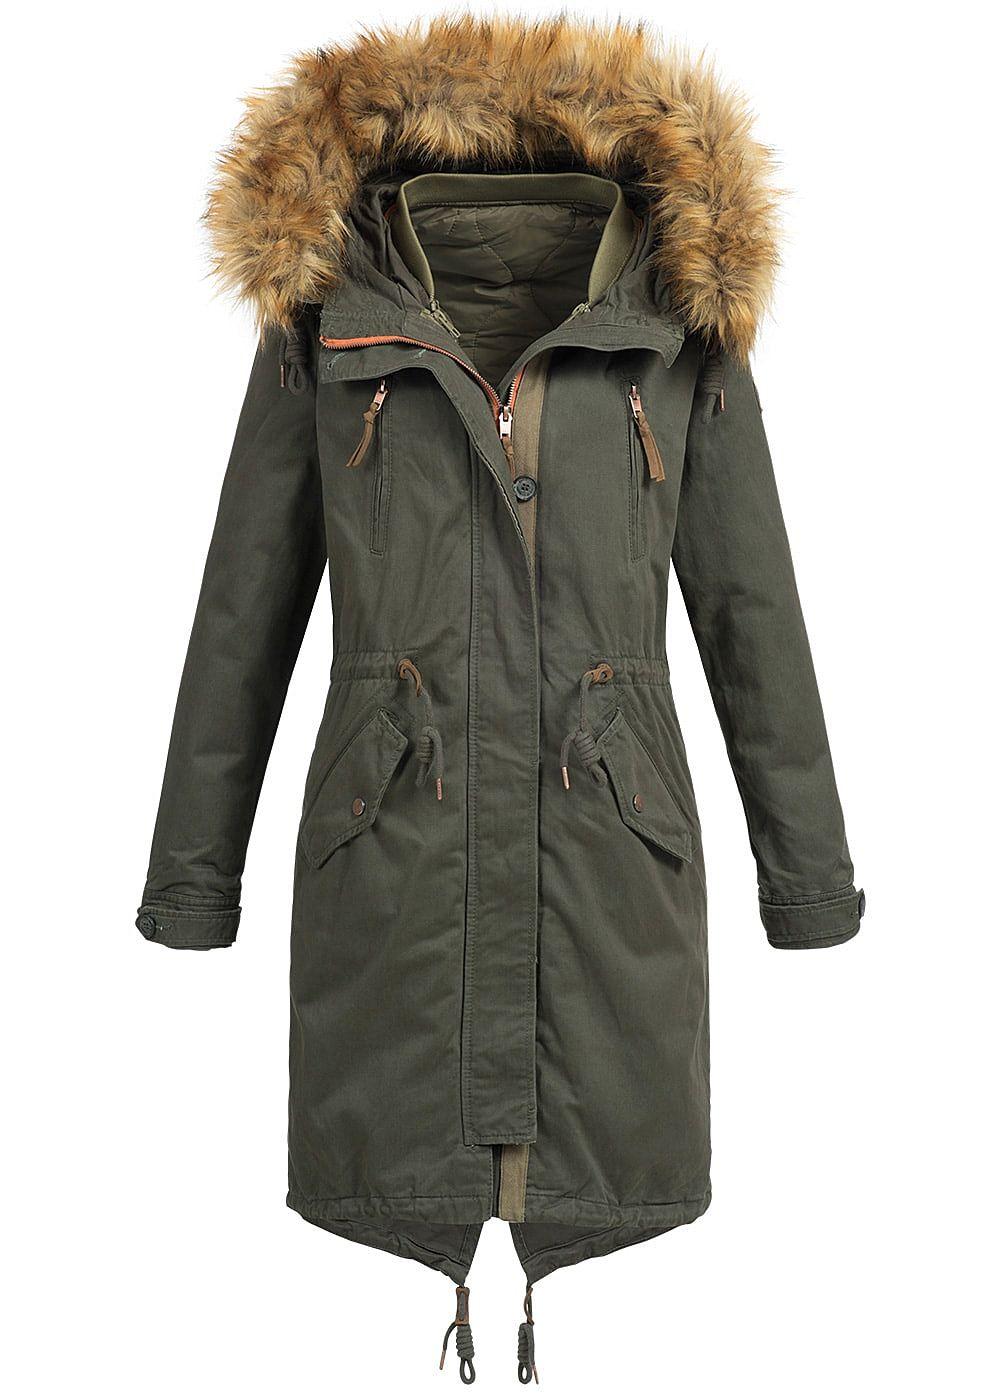 only damen winter mantel kapuze abnehmb kunstfell tunnelzug peat gr n 77onlineshop. Black Bedroom Furniture Sets. Home Design Ideas